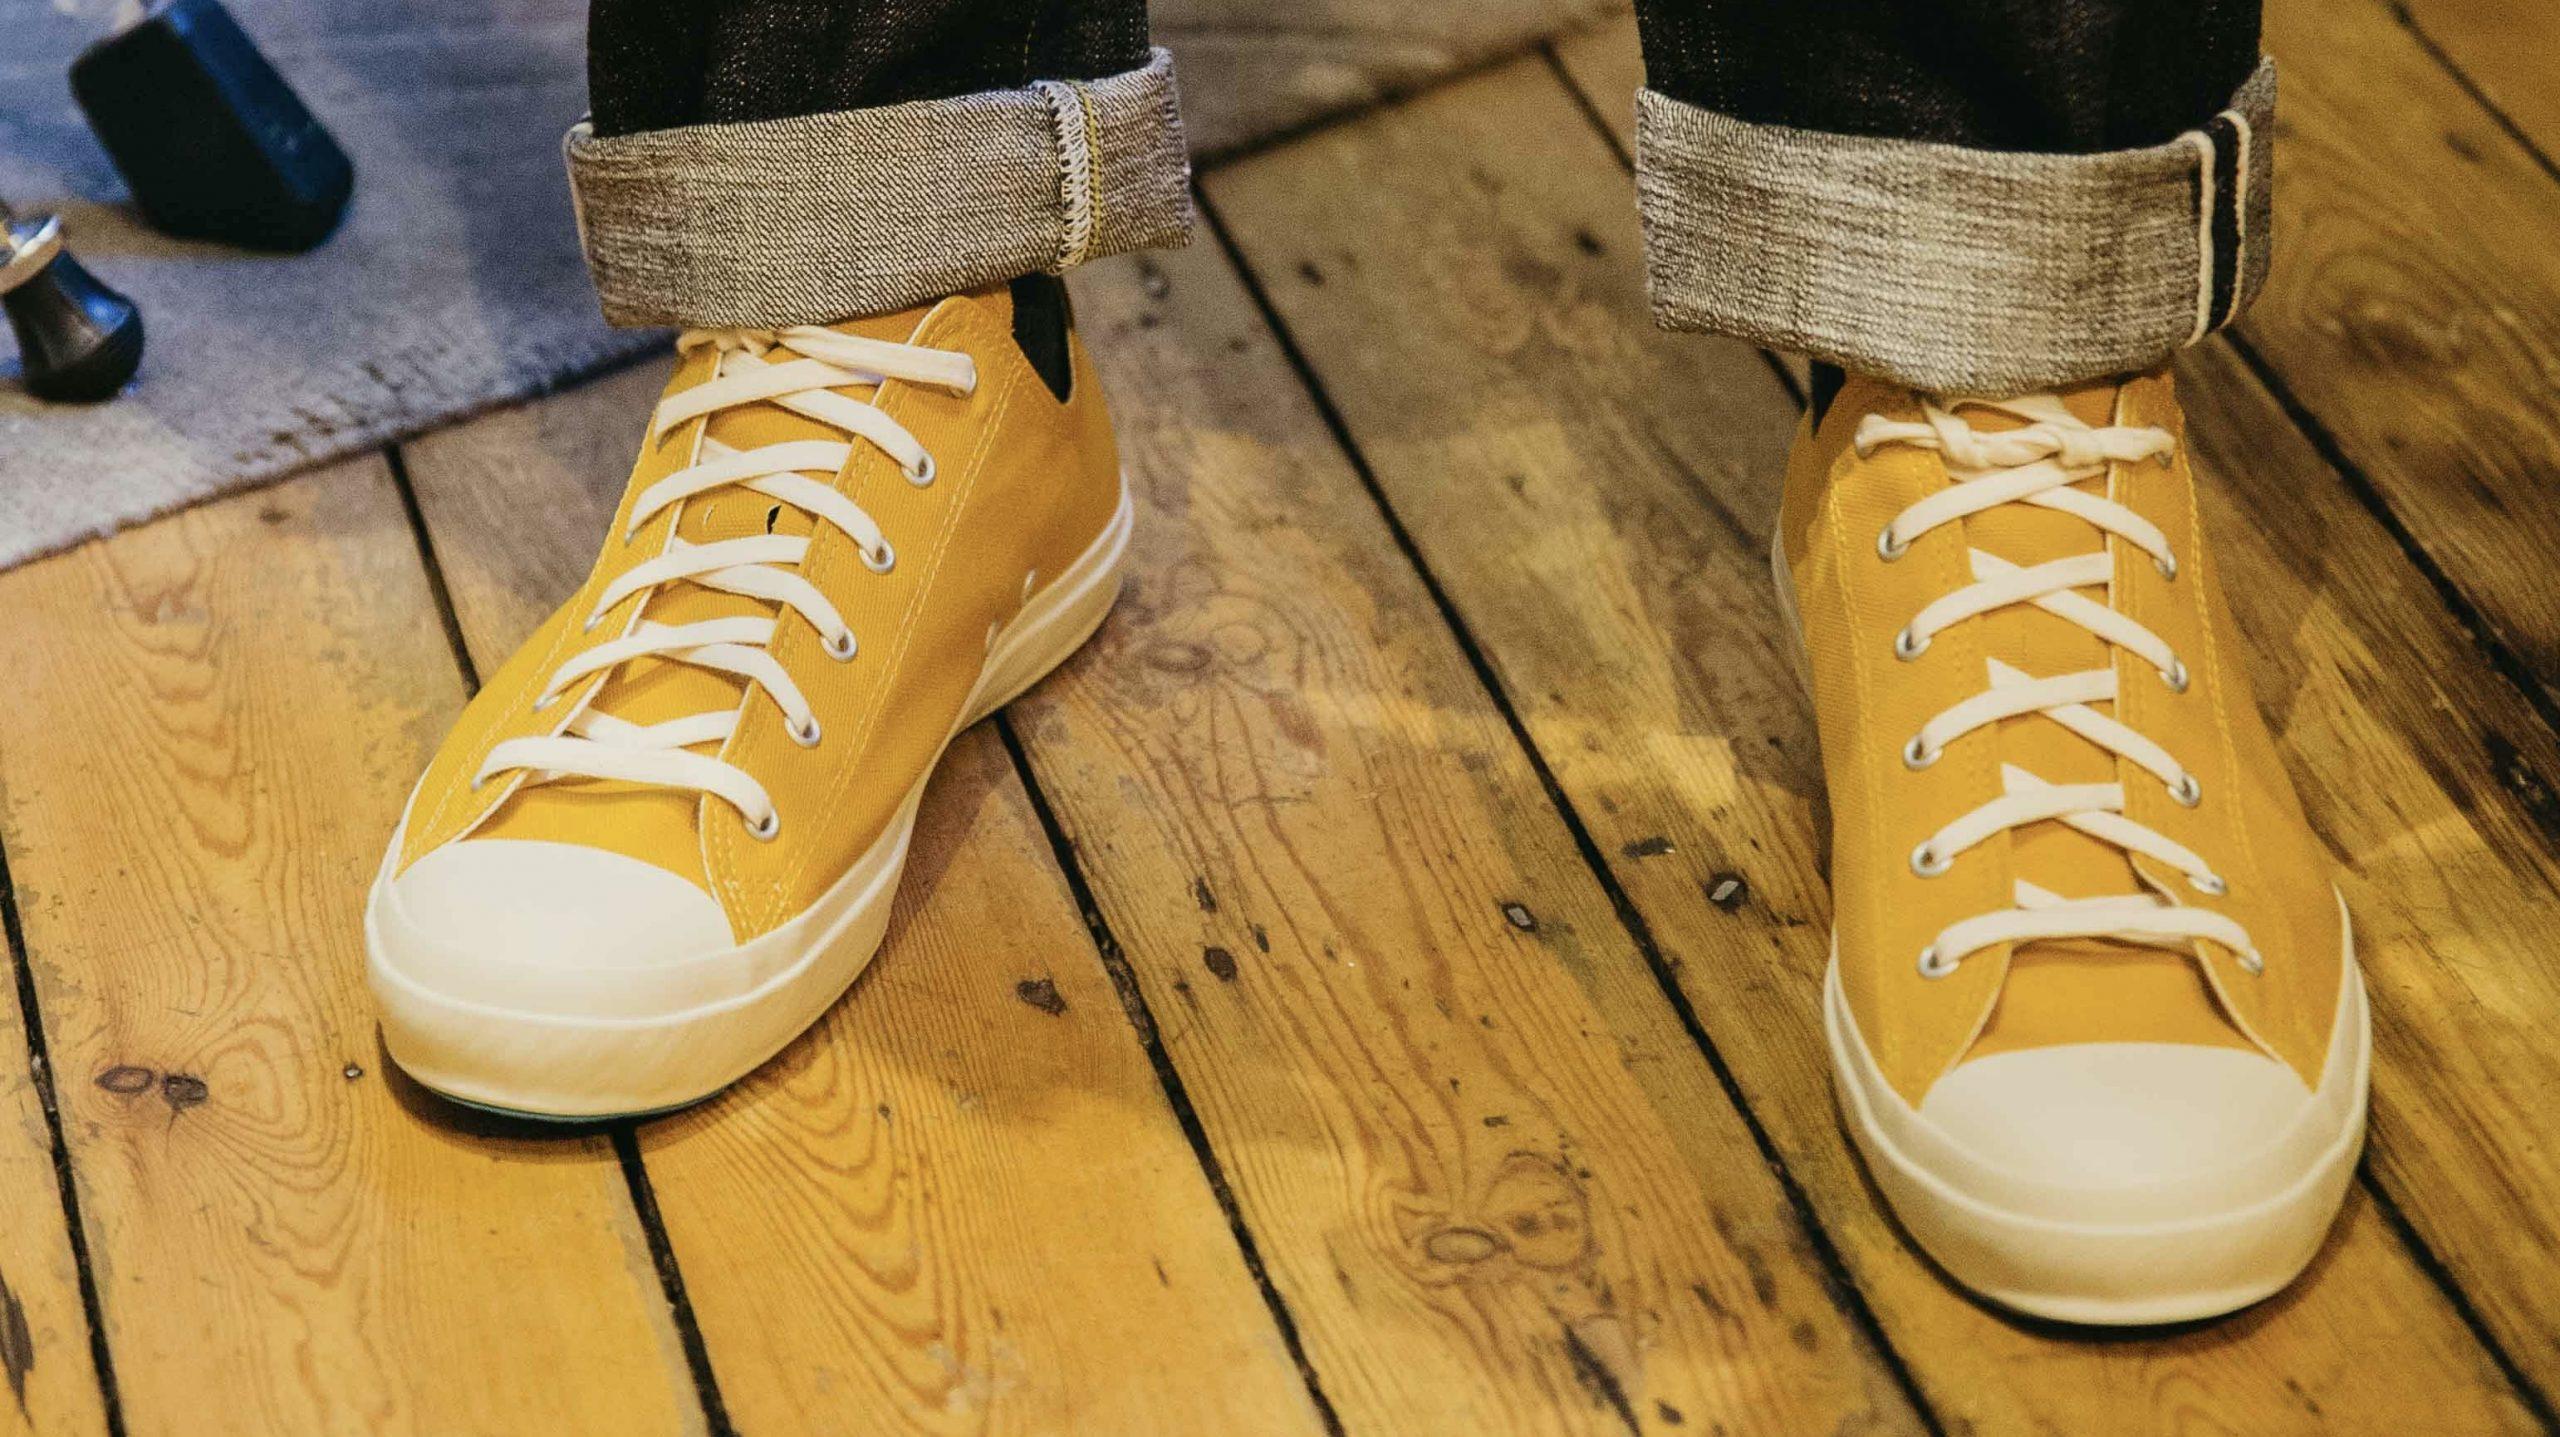 Shoes Like Pottery - John Simons